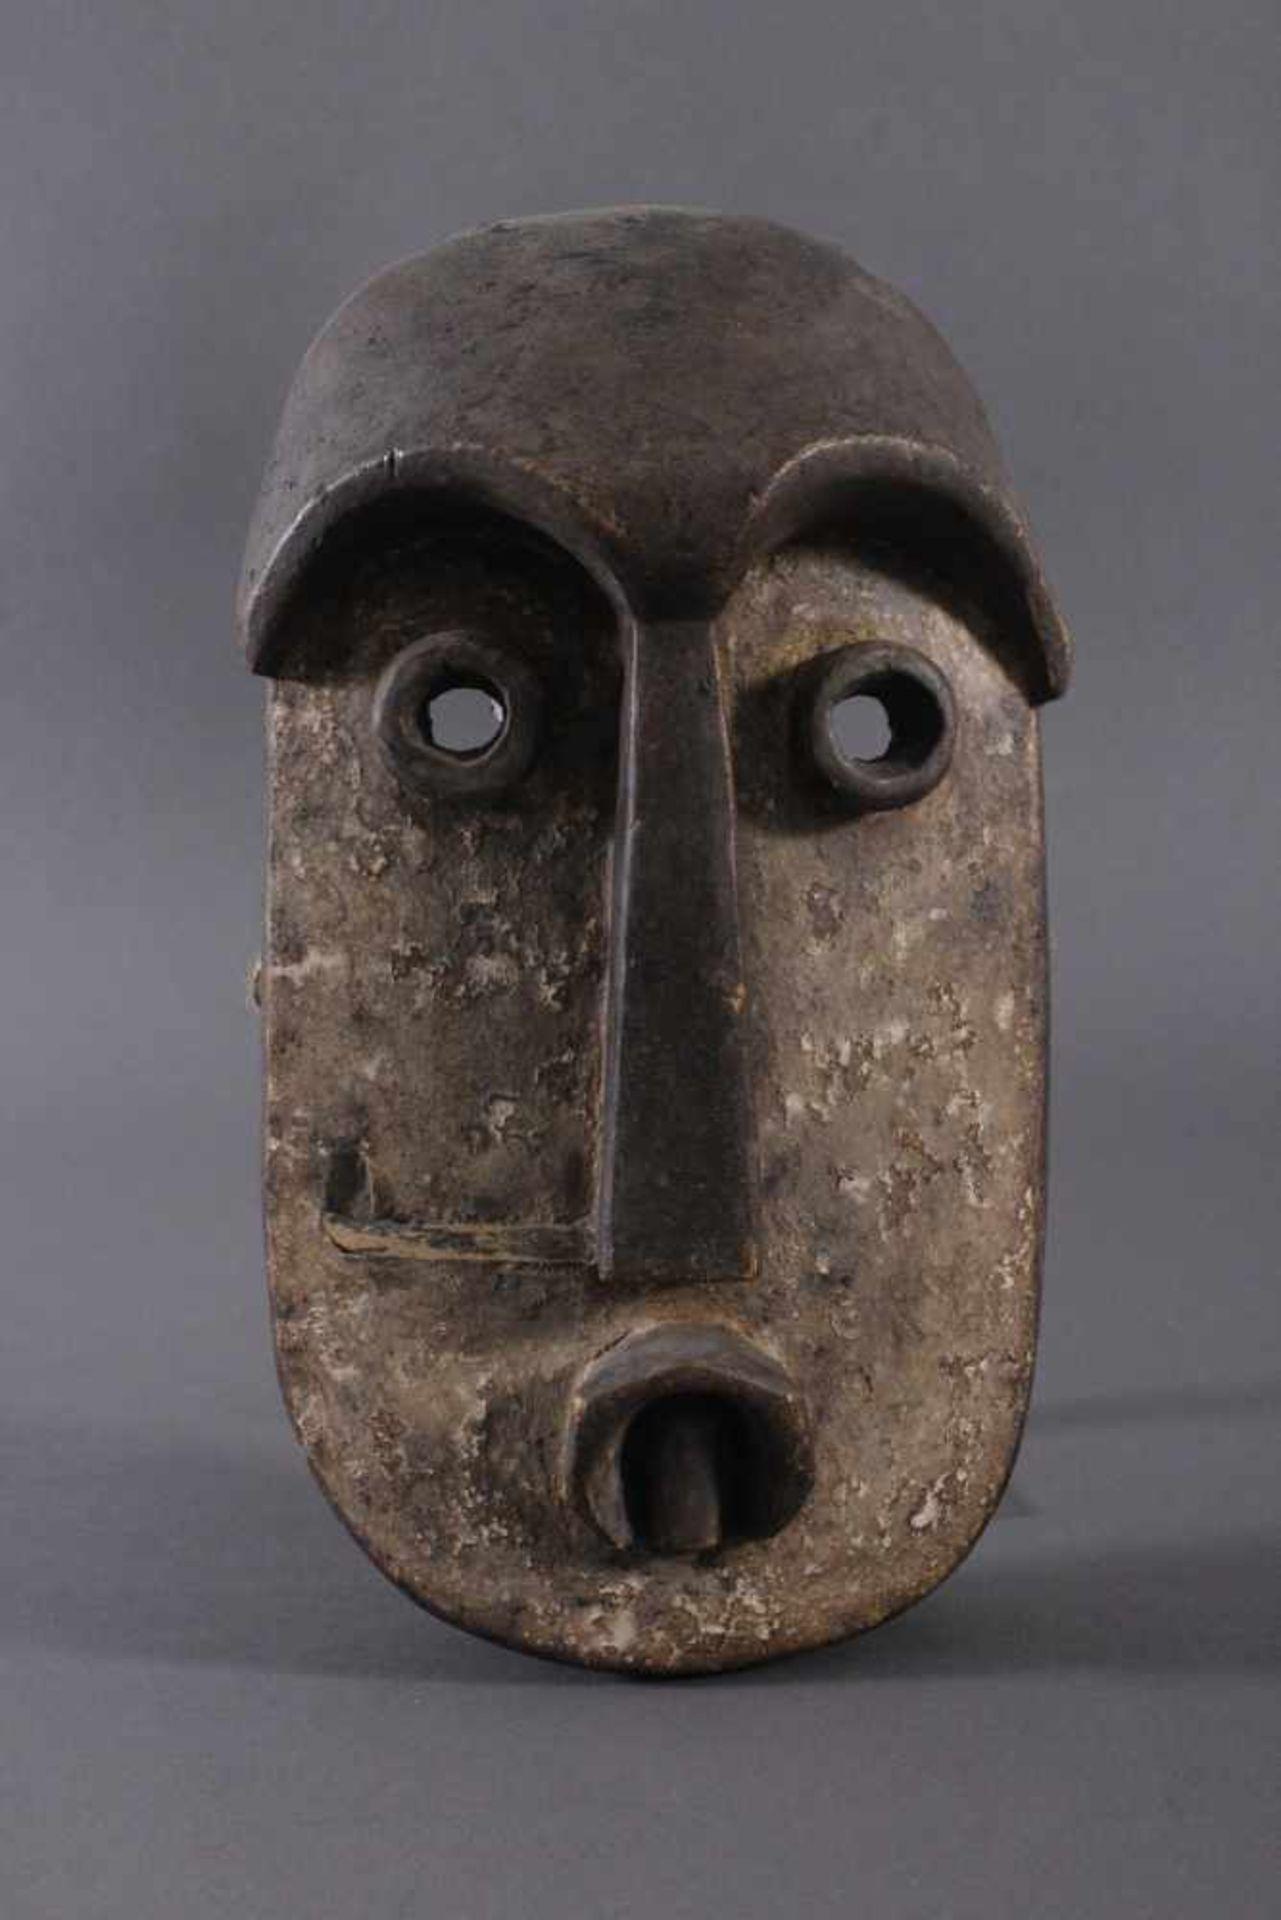 Antike Maske, Bembe, Kongo 1. Hälfte 20. Jh.Holz geschnitzt, runde Augen, dunkelbraune Patina, Reste